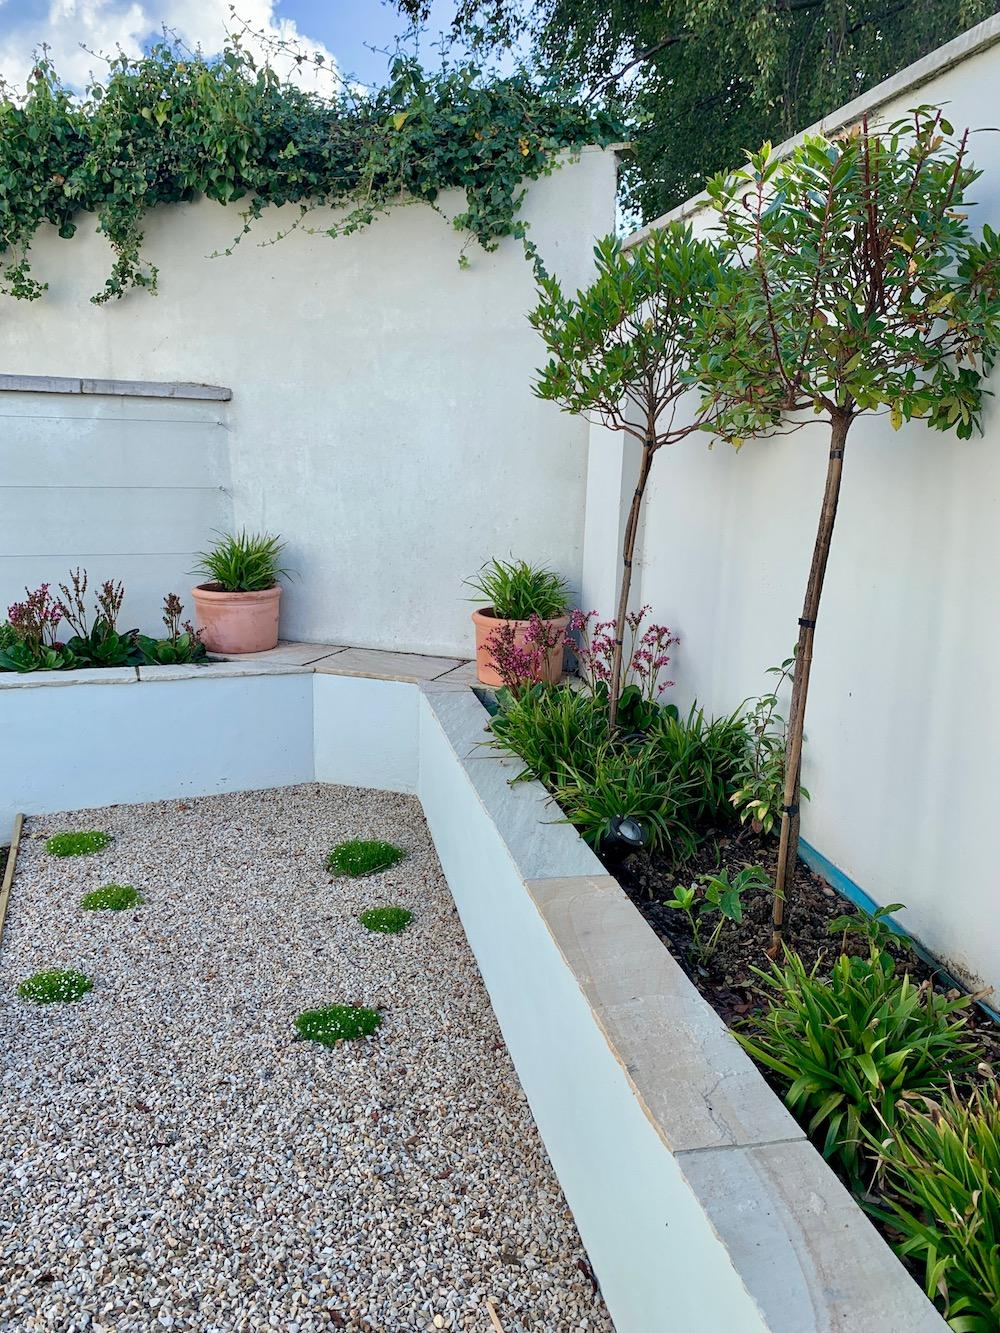 alex-alexandra-hollingsworth-garden-design-london-glenageary4.jpg